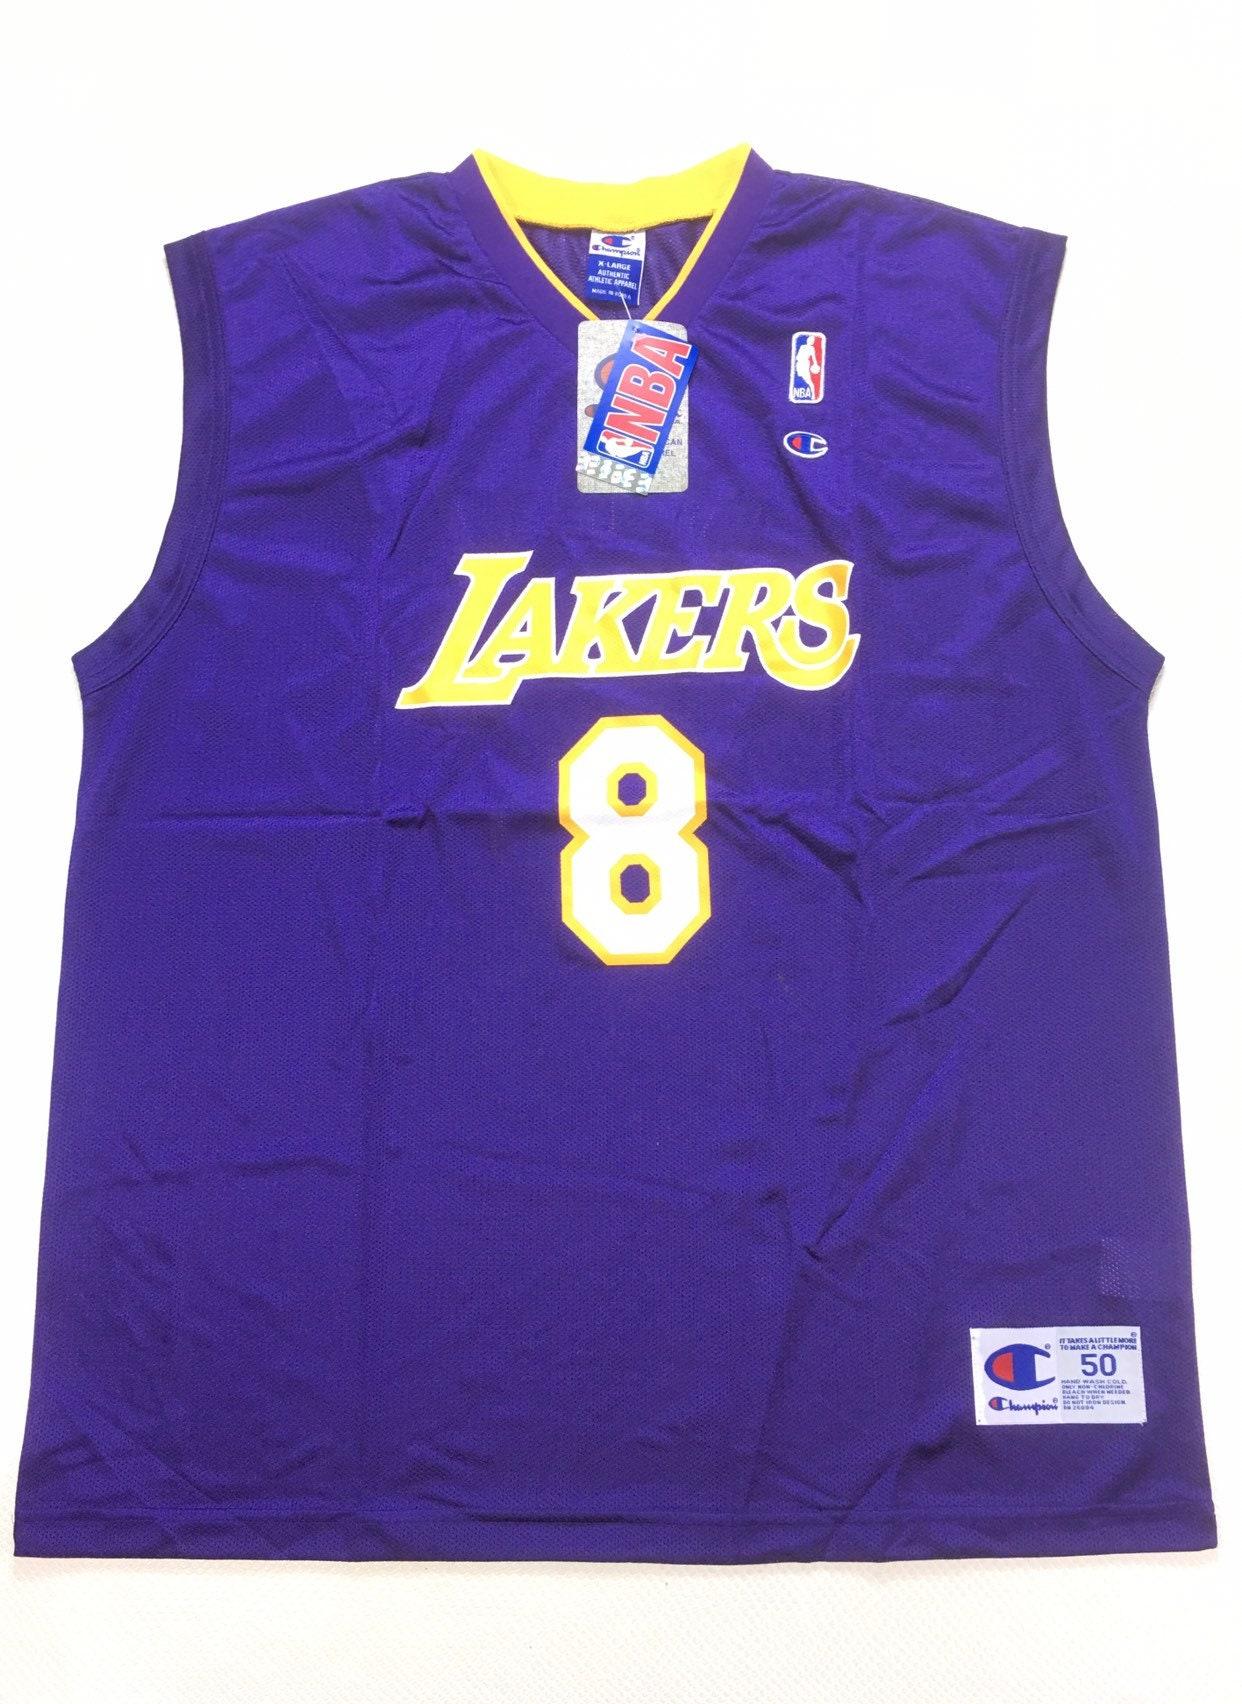 New with Tags 90s Vintage Champion Kobe Bryant Rookie #8 Purple Lakers Jersey 50 XL, Original Kobe Bryant #8 Champion Lakers Jersey XL